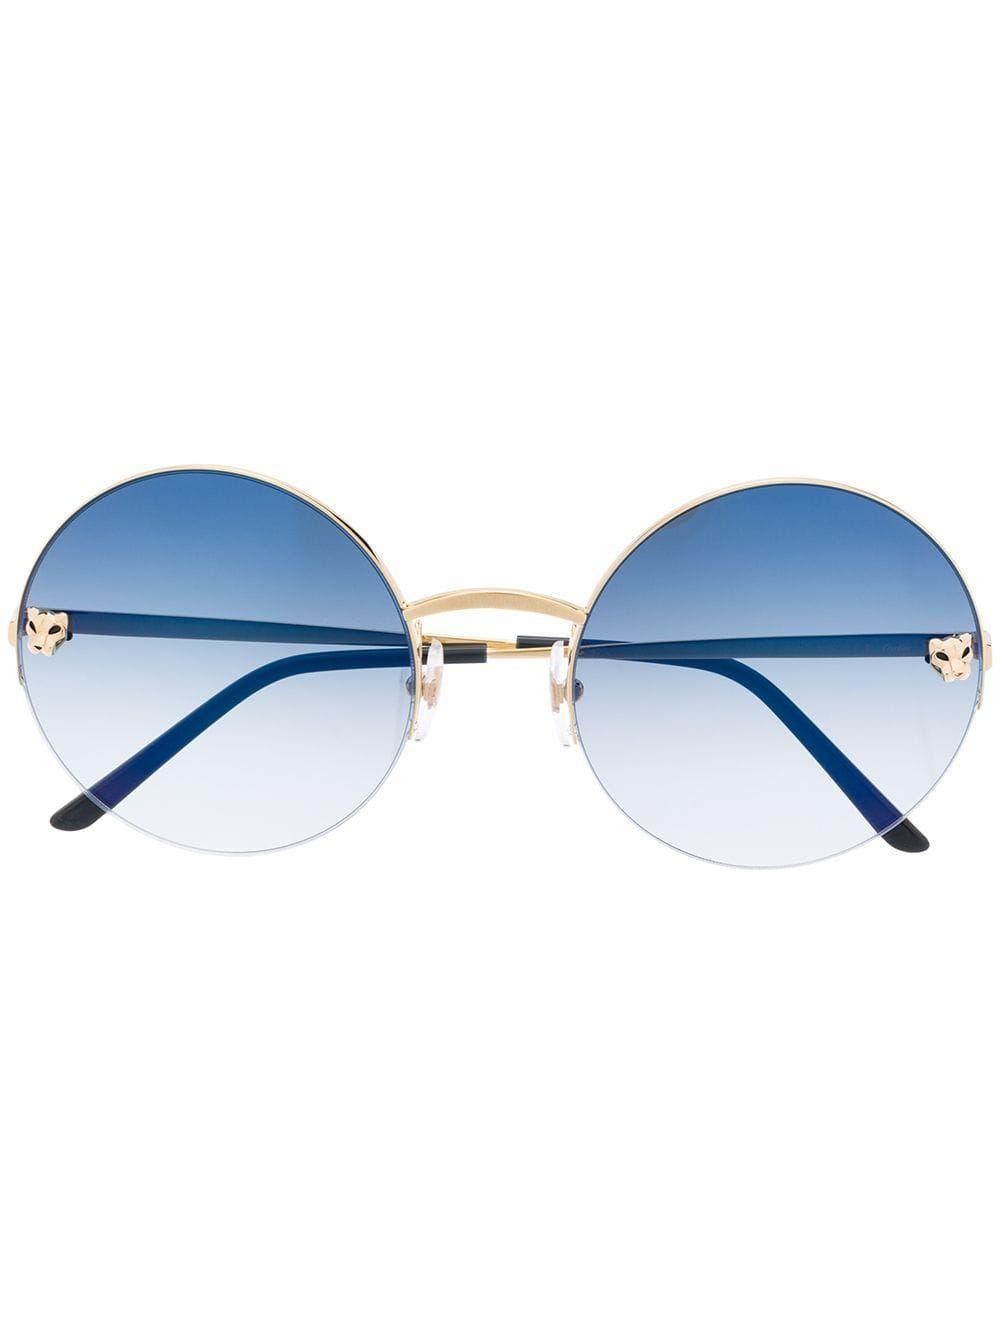 Cartier Eyewear Panthère De Cartier Sunglasses  – Farfetch